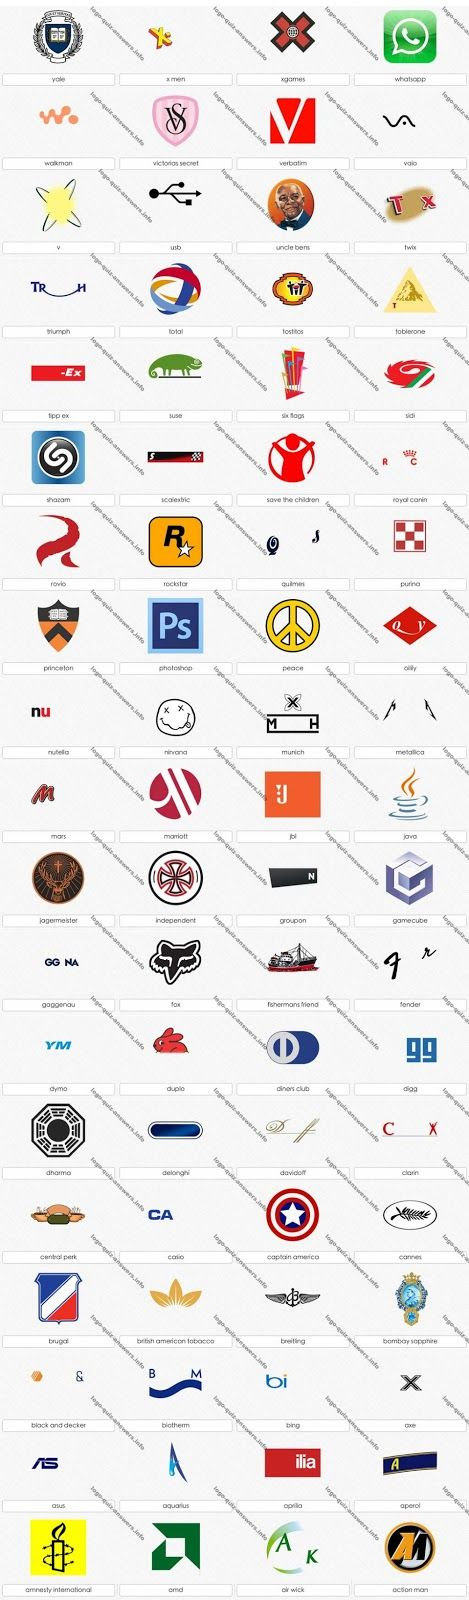 Parufile Logo Quiz Answers 2013 Logo Quiz Answers Logo Quiz Logo Quiz Games